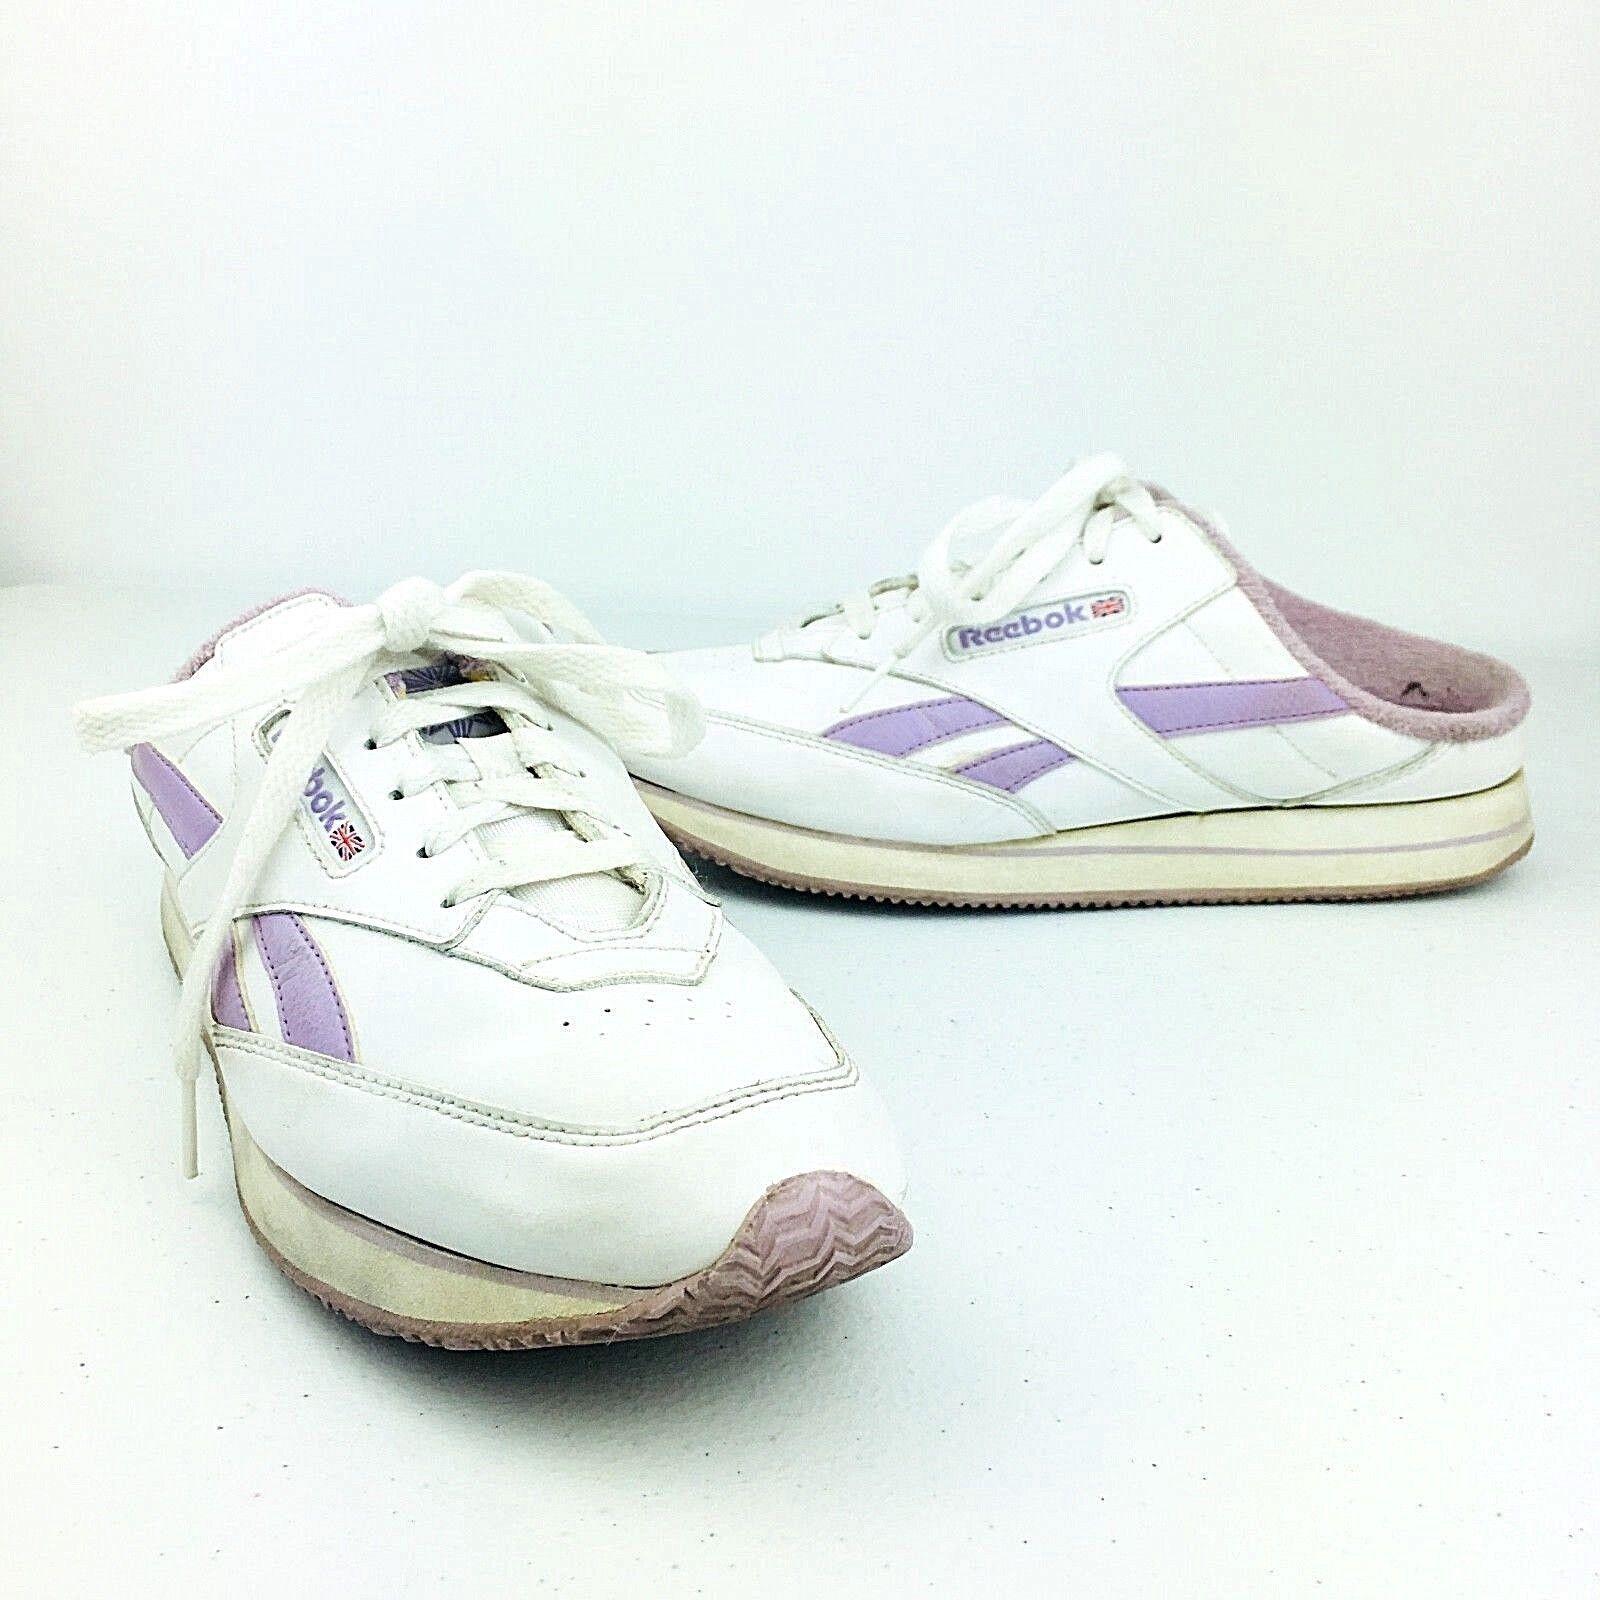 Reebok Damenschuhe Skeakers Schuhes WEISS Purple Slide Slip On Classic Vintage 80s 90s